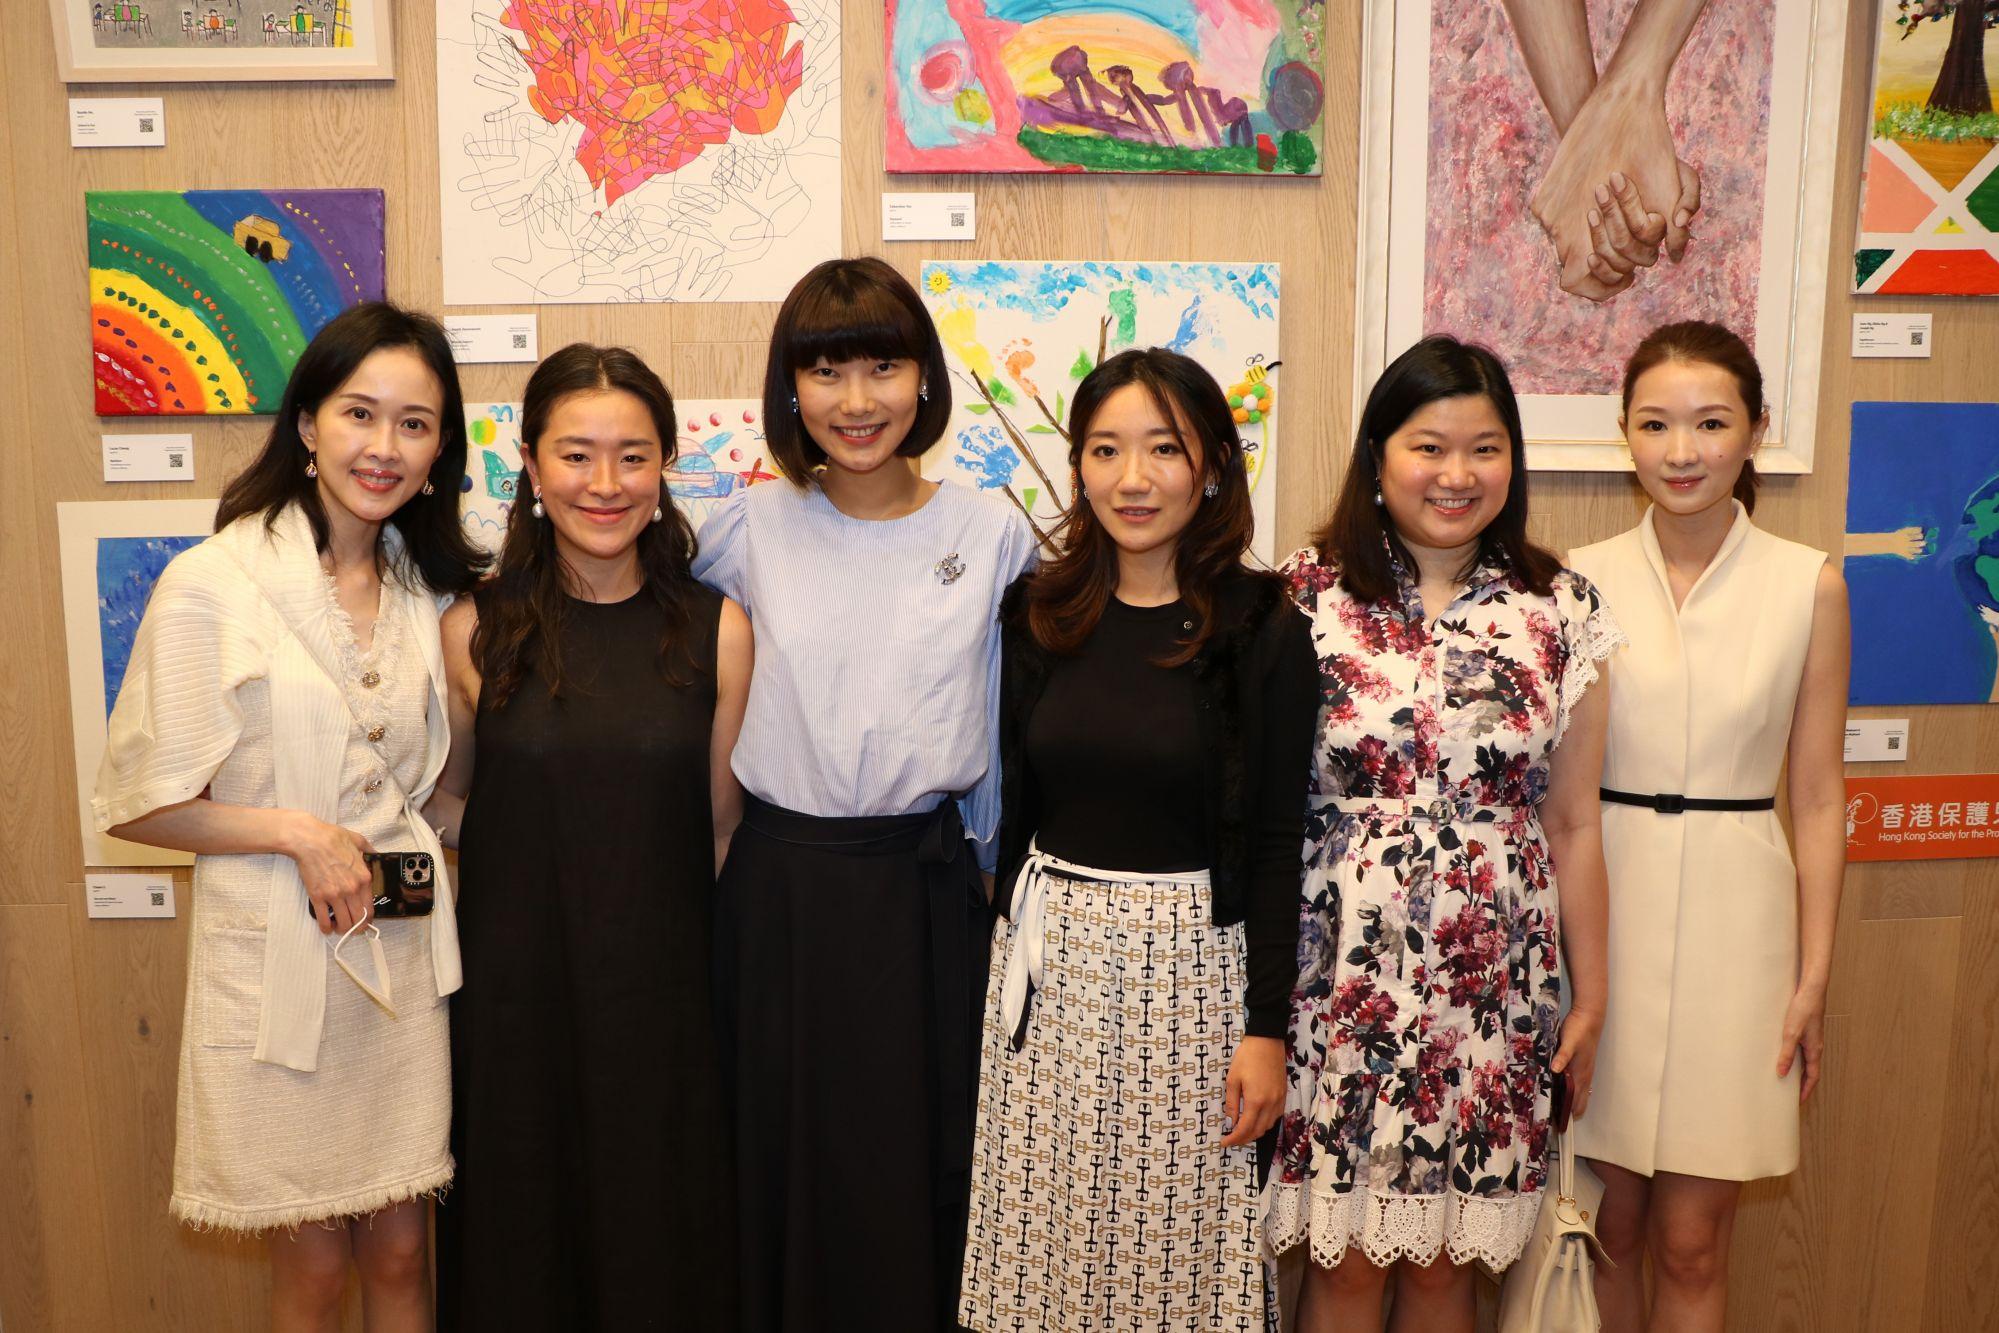 Jacqueline Chow, Katherine Kung, Nydia Zhang, Julia Liu, Carmen Choi and Claire Chen